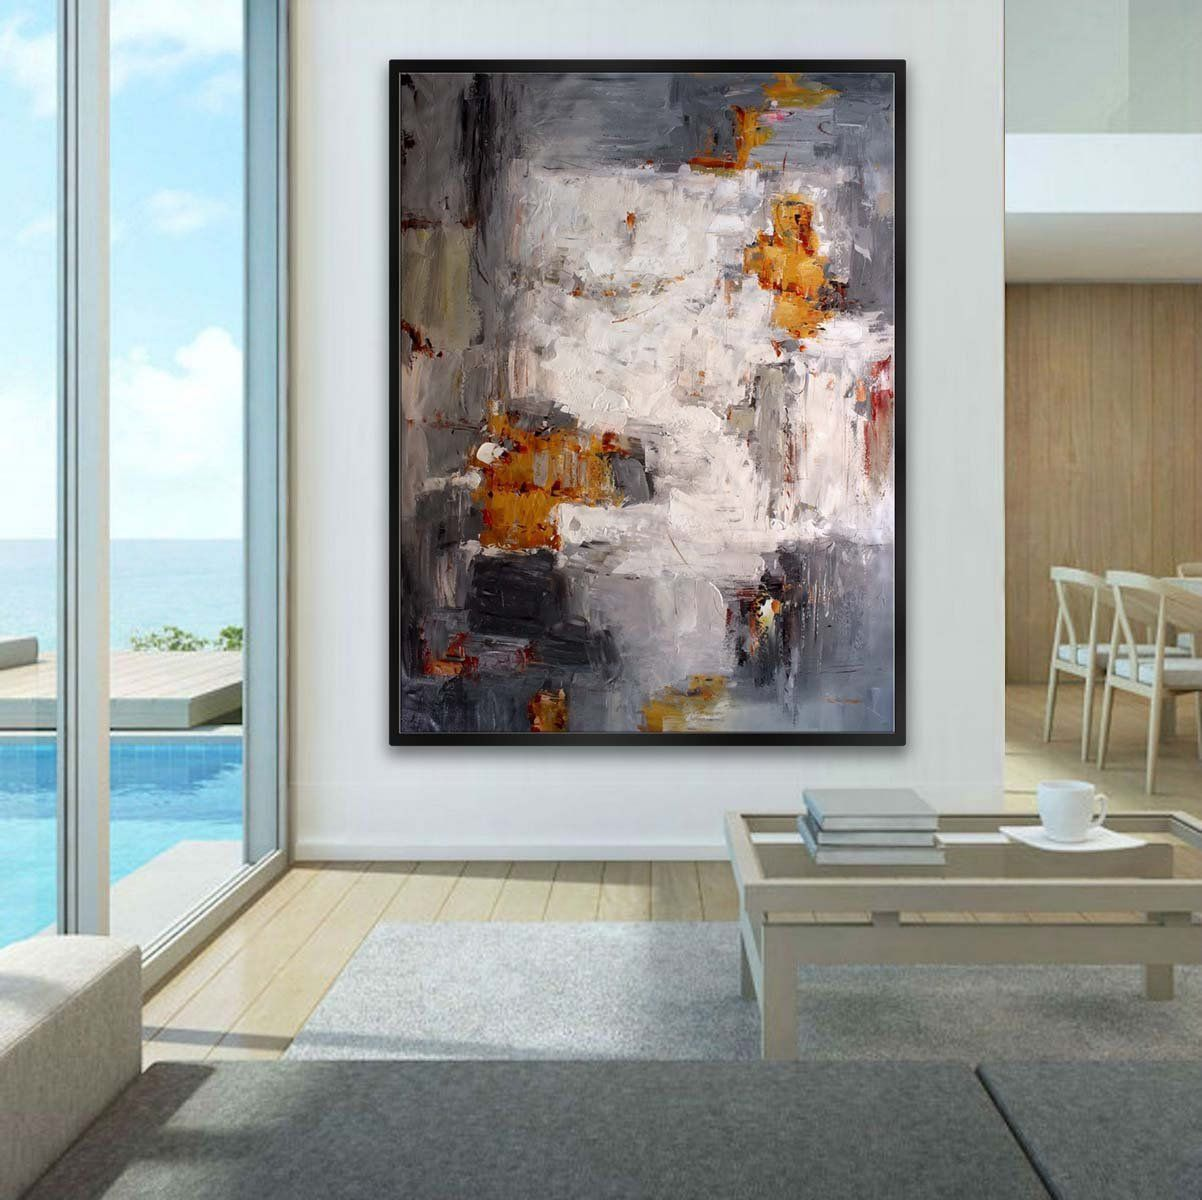 Extra Large Abstract Huge Handmade Palette Knife Painting Contemporary Modern Wall Art Decor Vertical Hanging 60x80 150x200cm Xxxl Modern Wall Decor Art Colorful Abstract Painting Large Abstract Wall Art